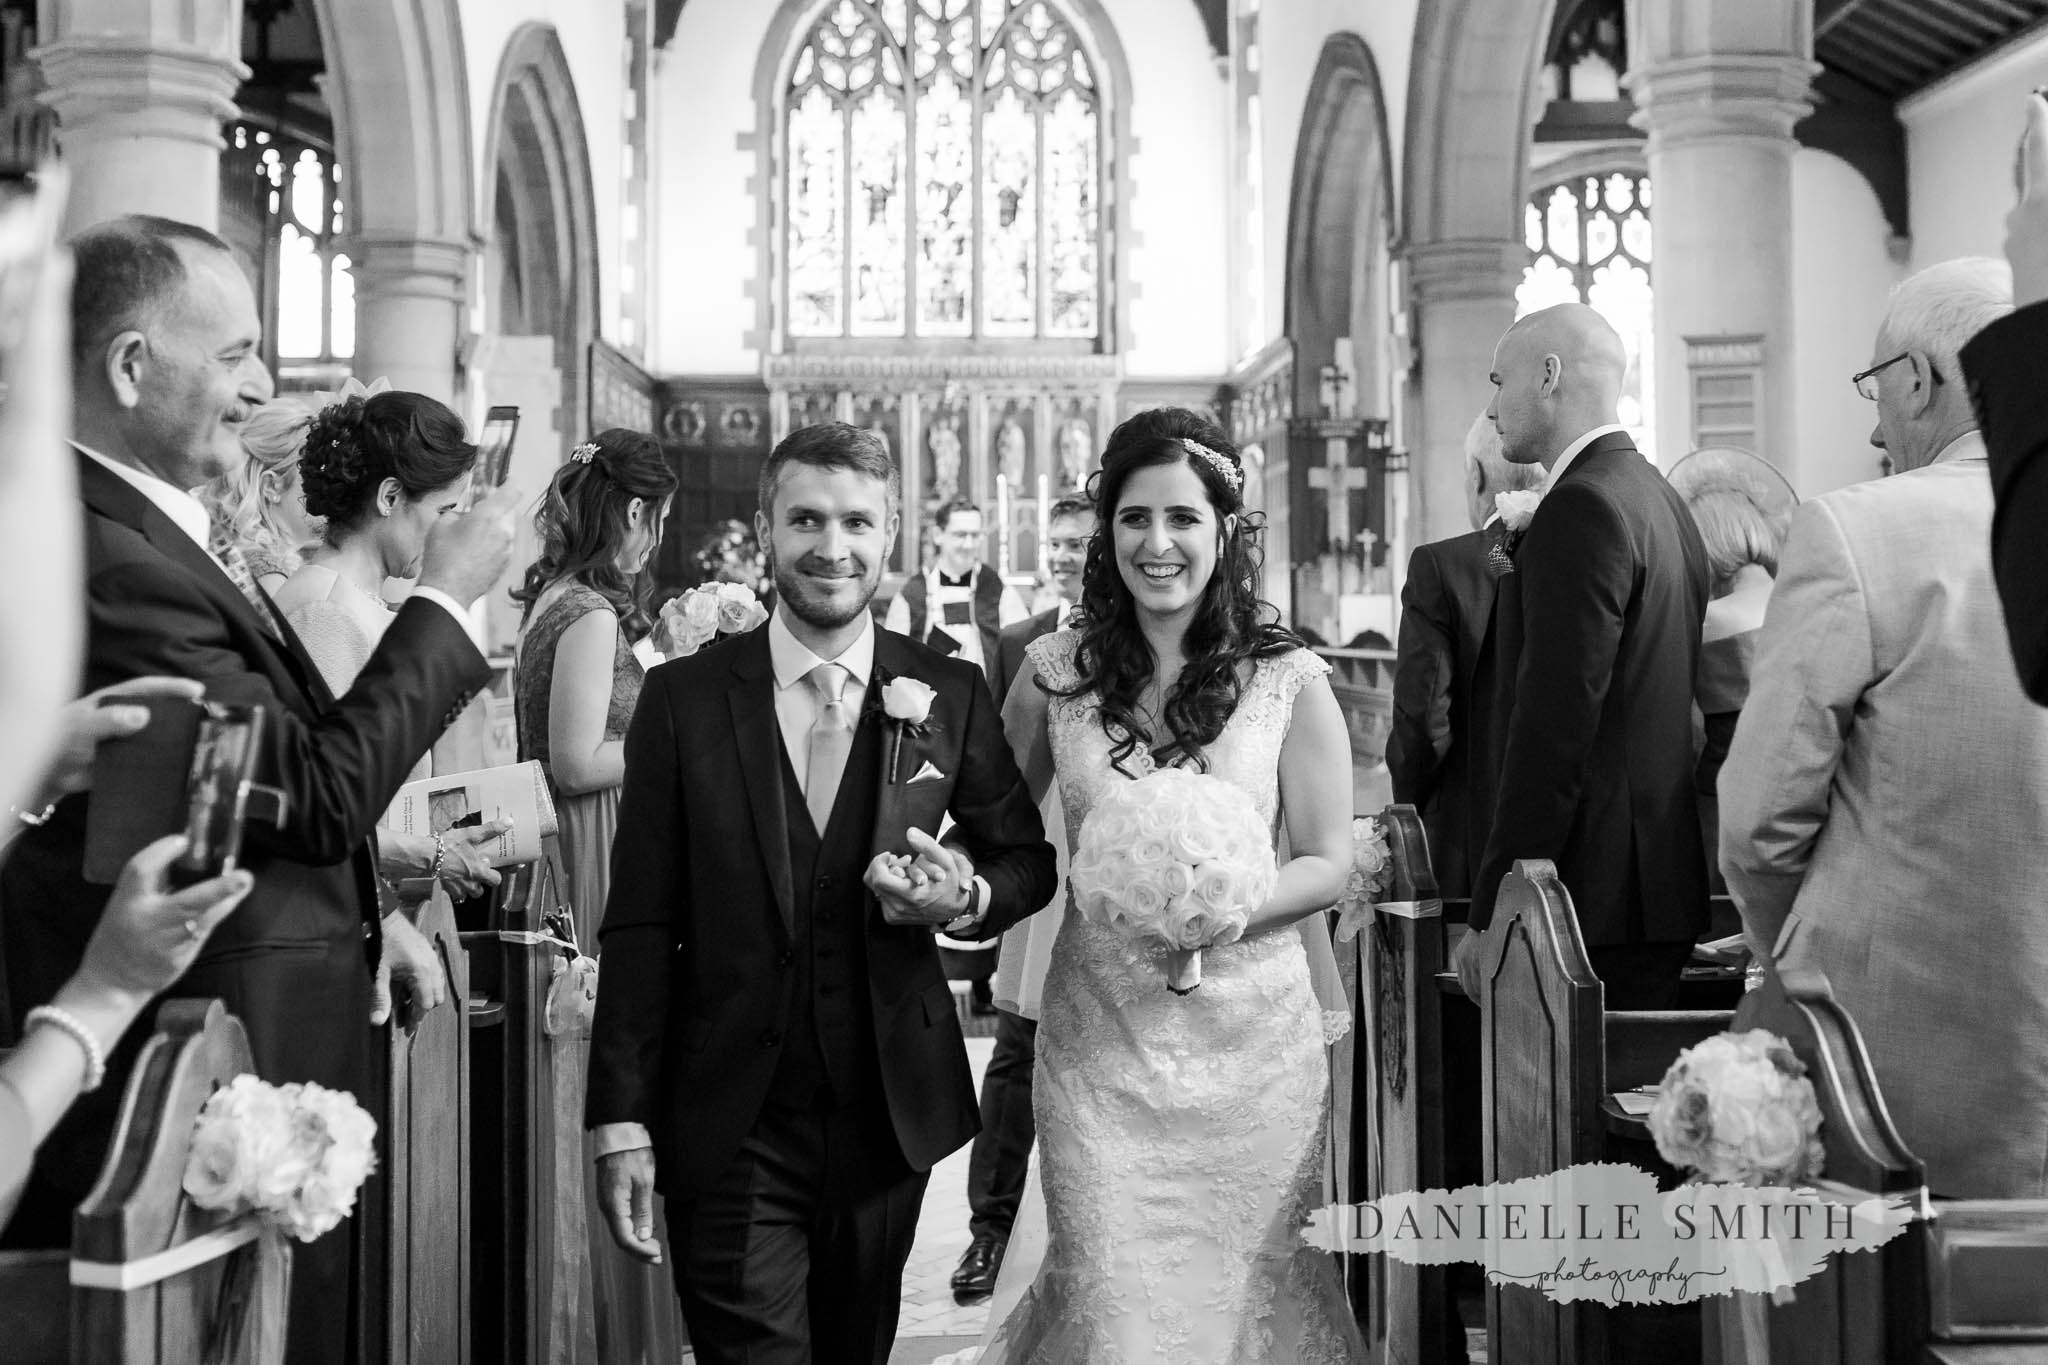 turkish bride and english groom walking down aisle